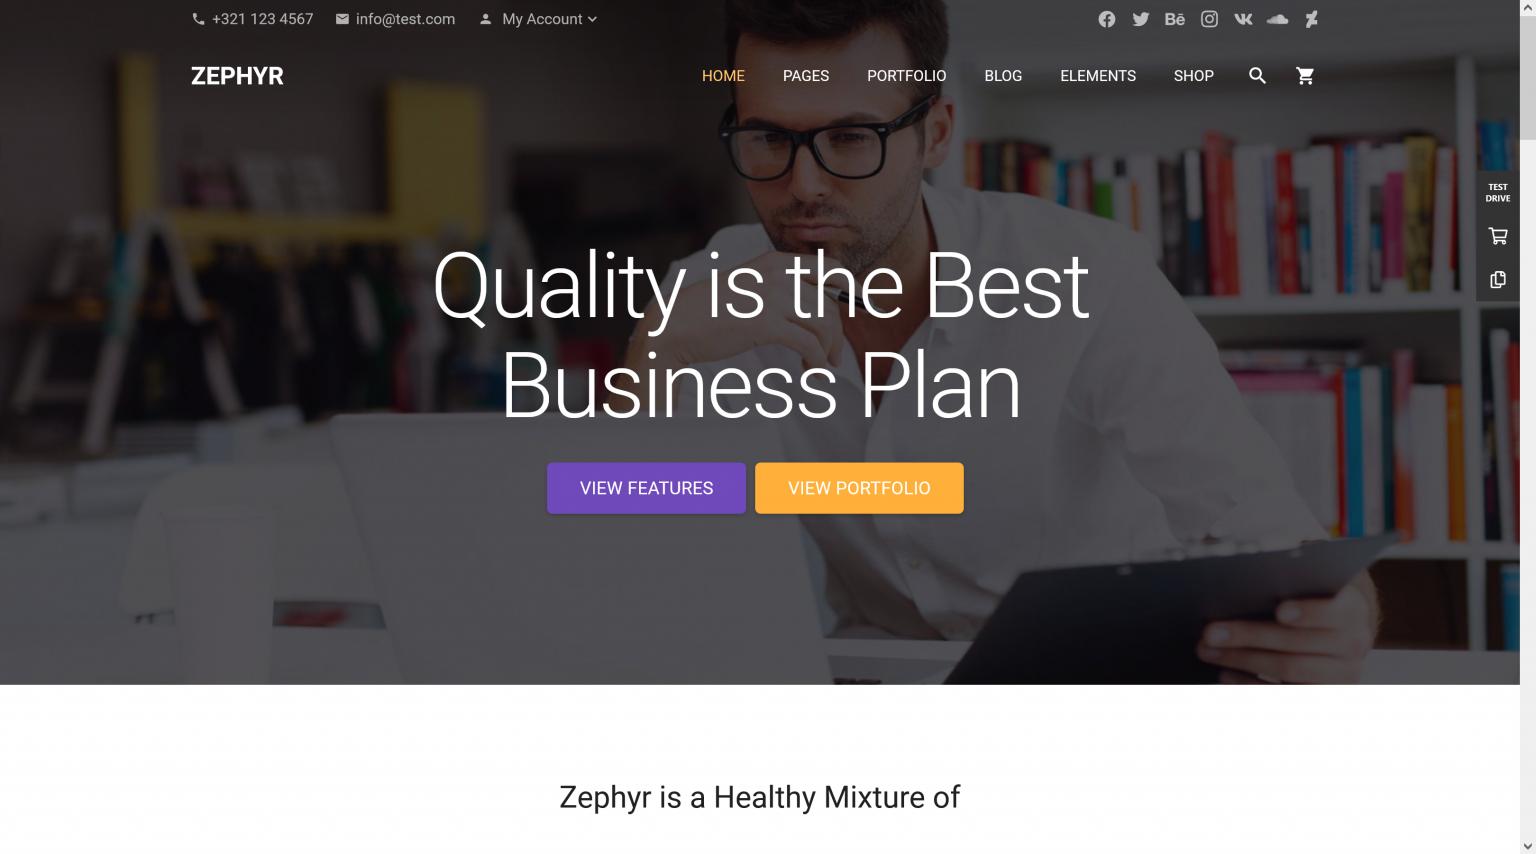 Zephyr Material Design Theme 8.3.2